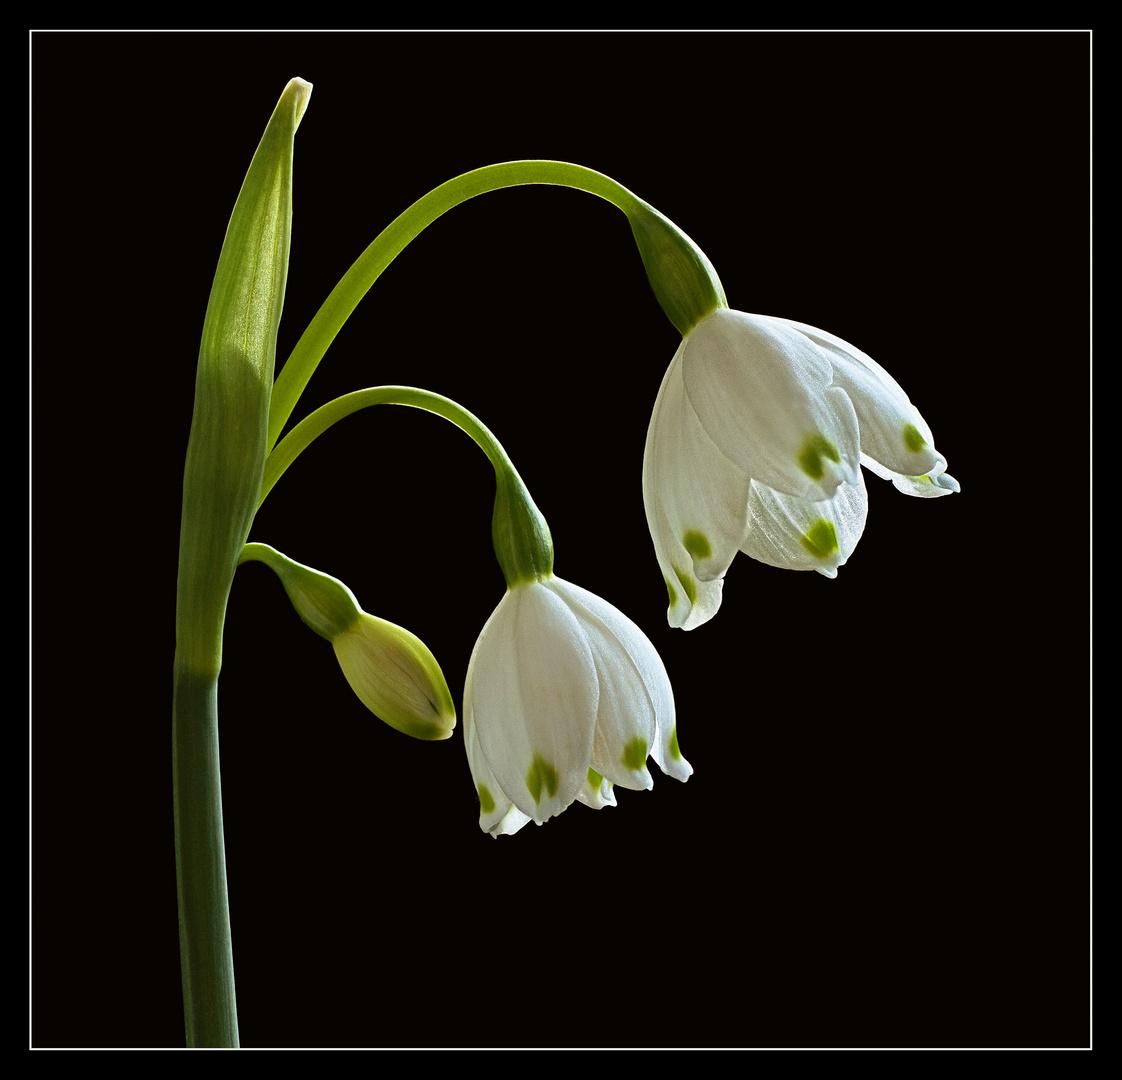 Sommer Knotenblume - Märzenbecher